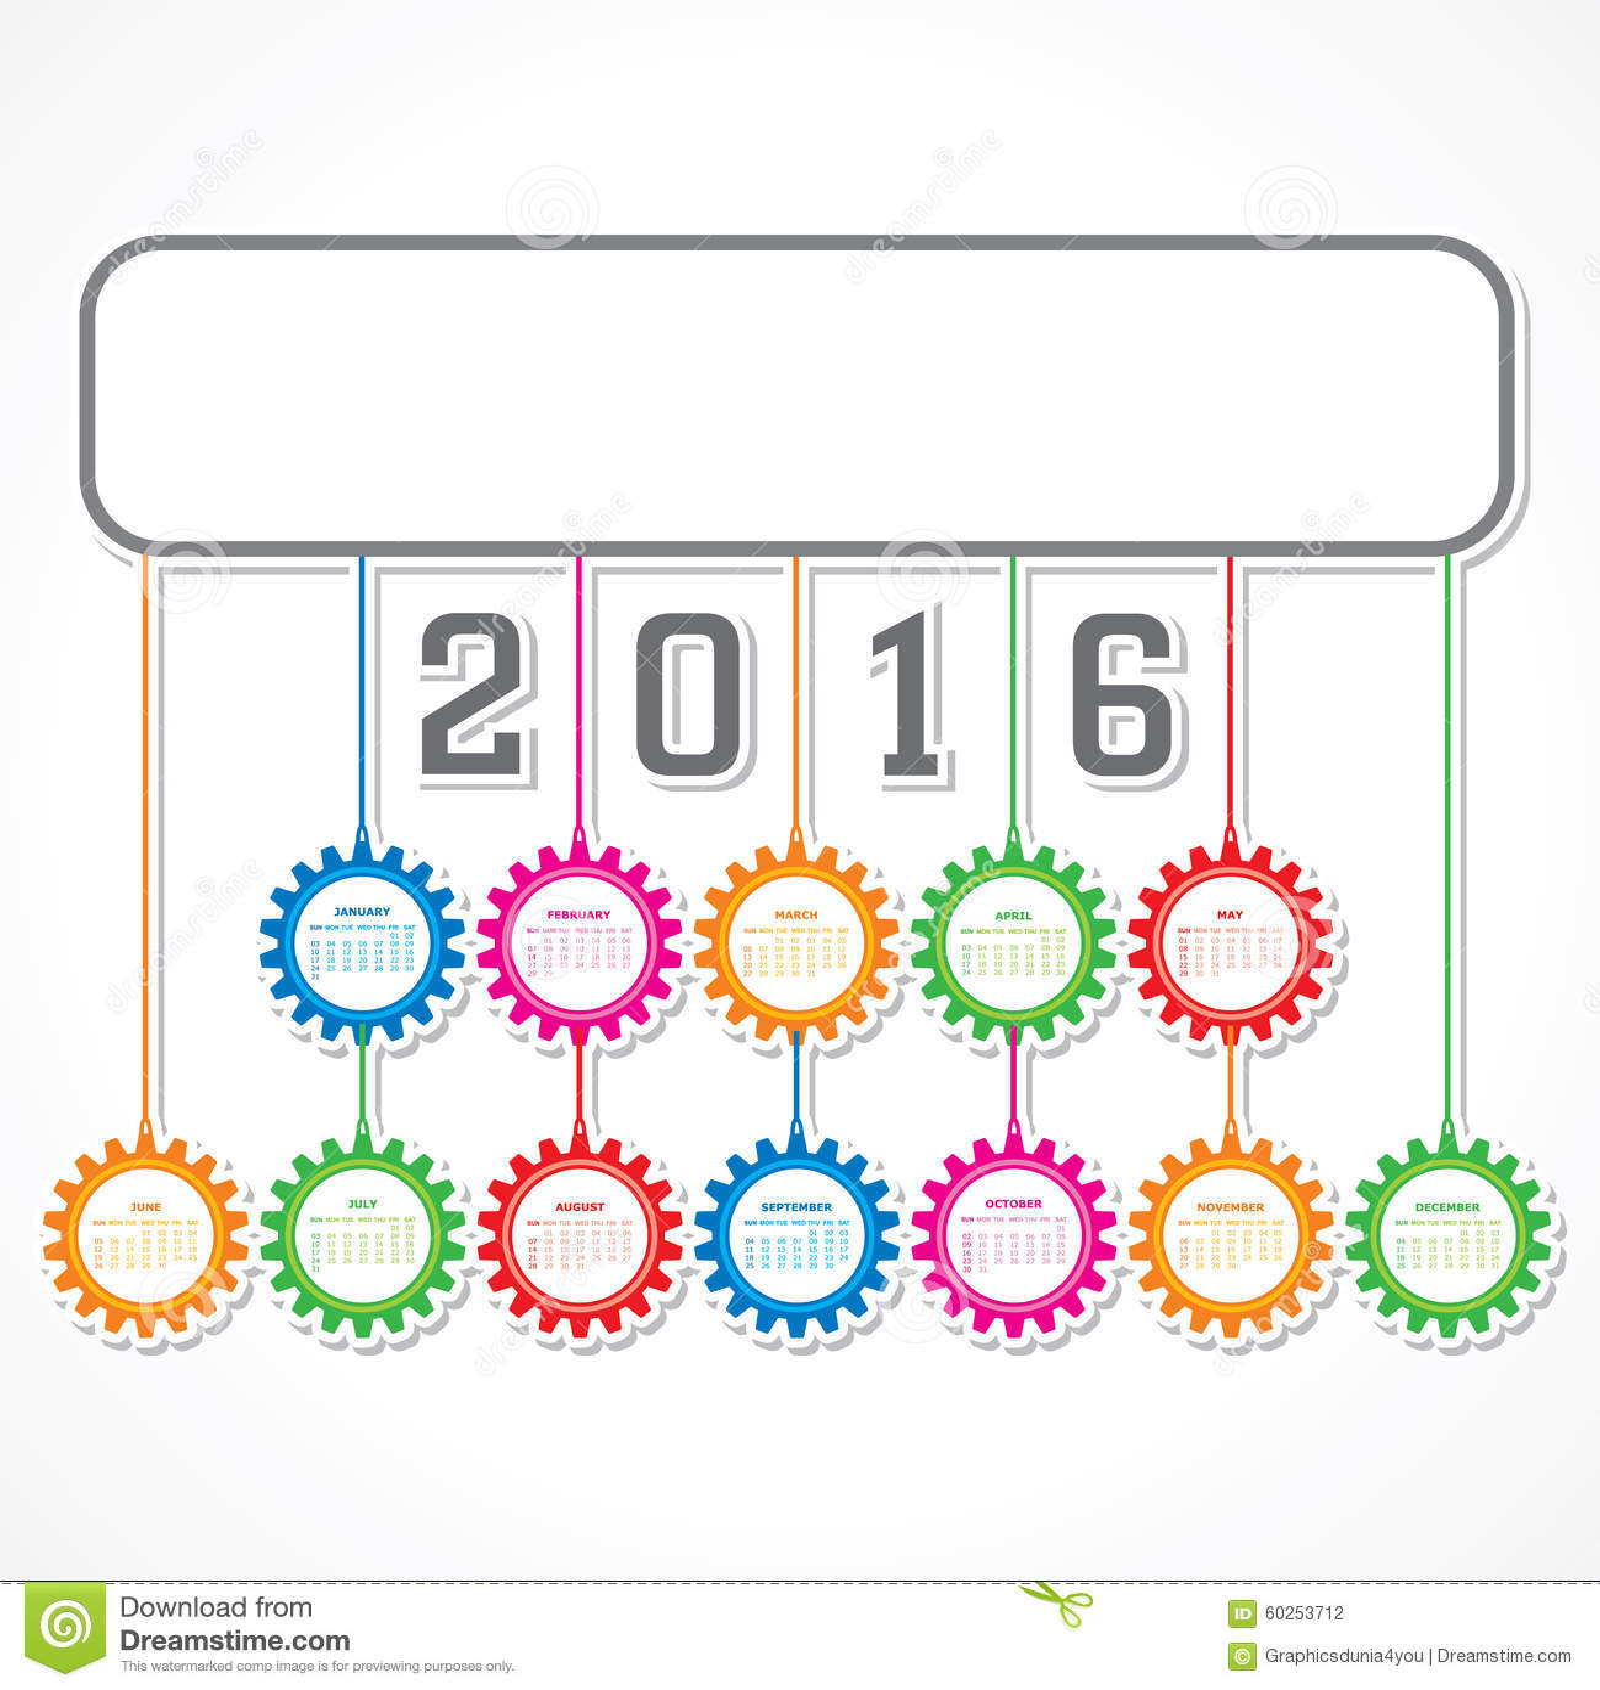 New Year Calendar Design : Creative new year calendar design stock vector